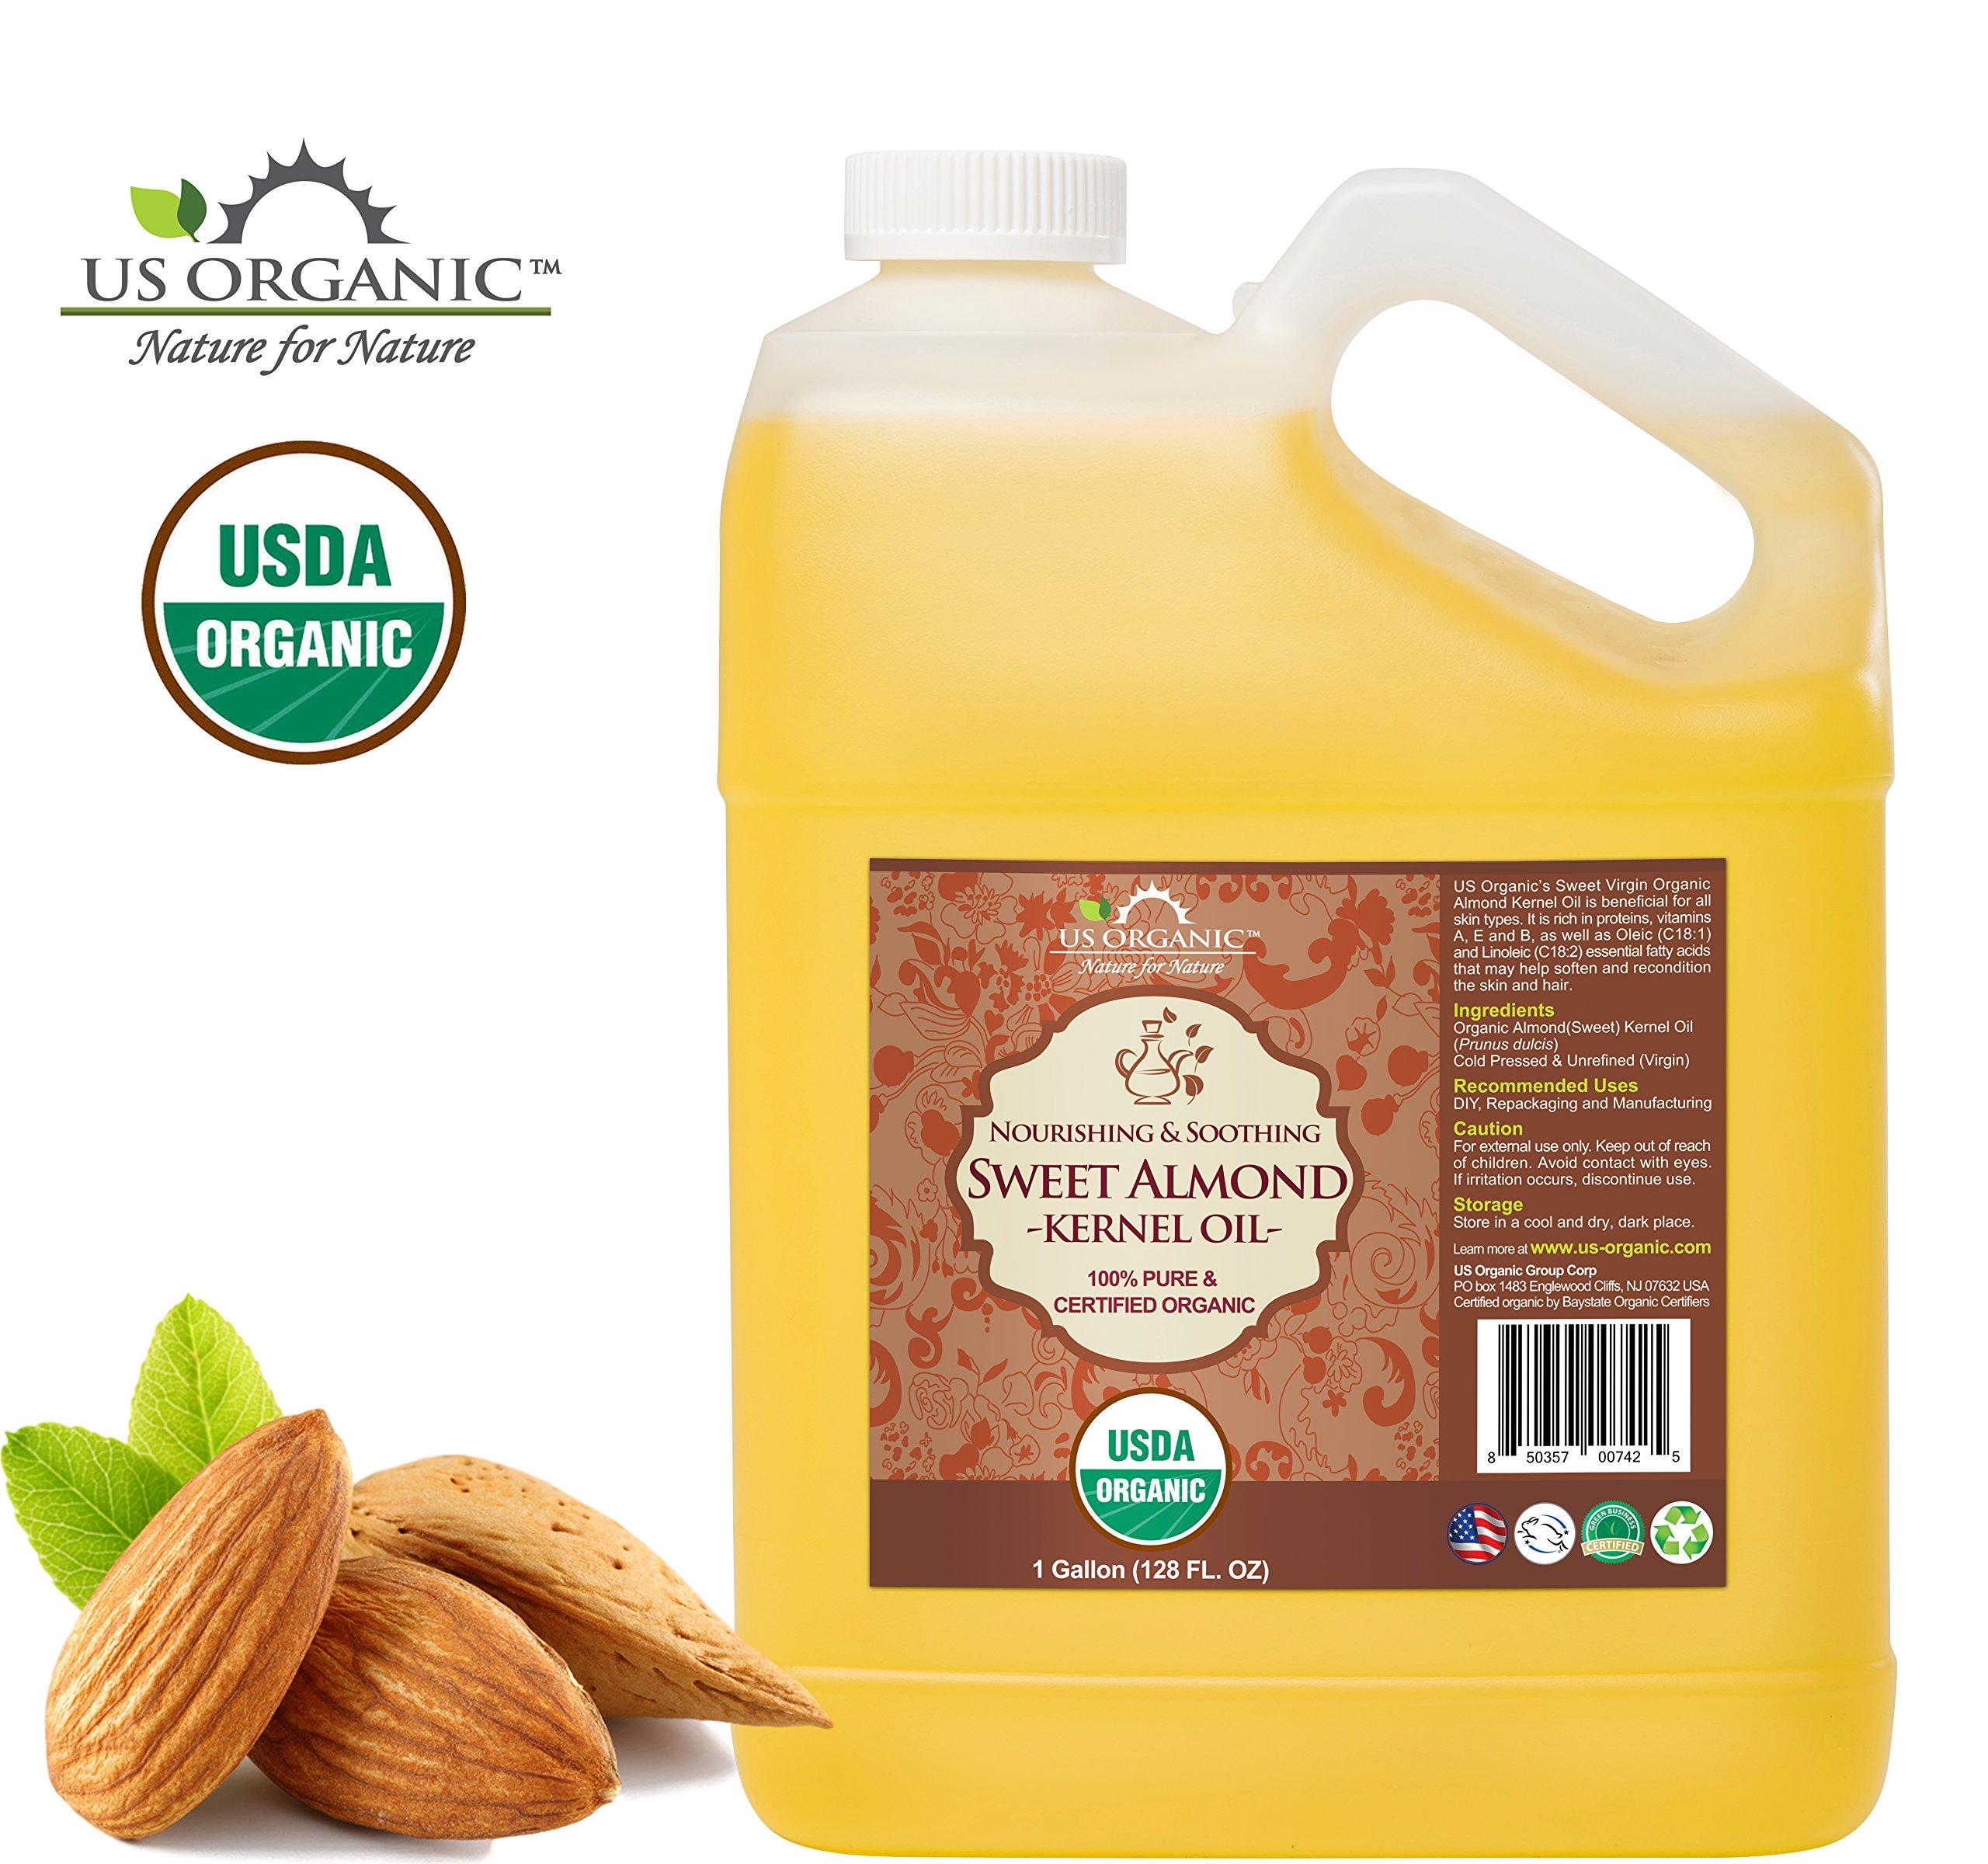 US Organic Sweet Almond Kernel Oil Bulk pack, USDA Certified Organic,100% Pure & Natural, Cold Pressed Virgin, Unrefined (128 oz (1 Gallon))